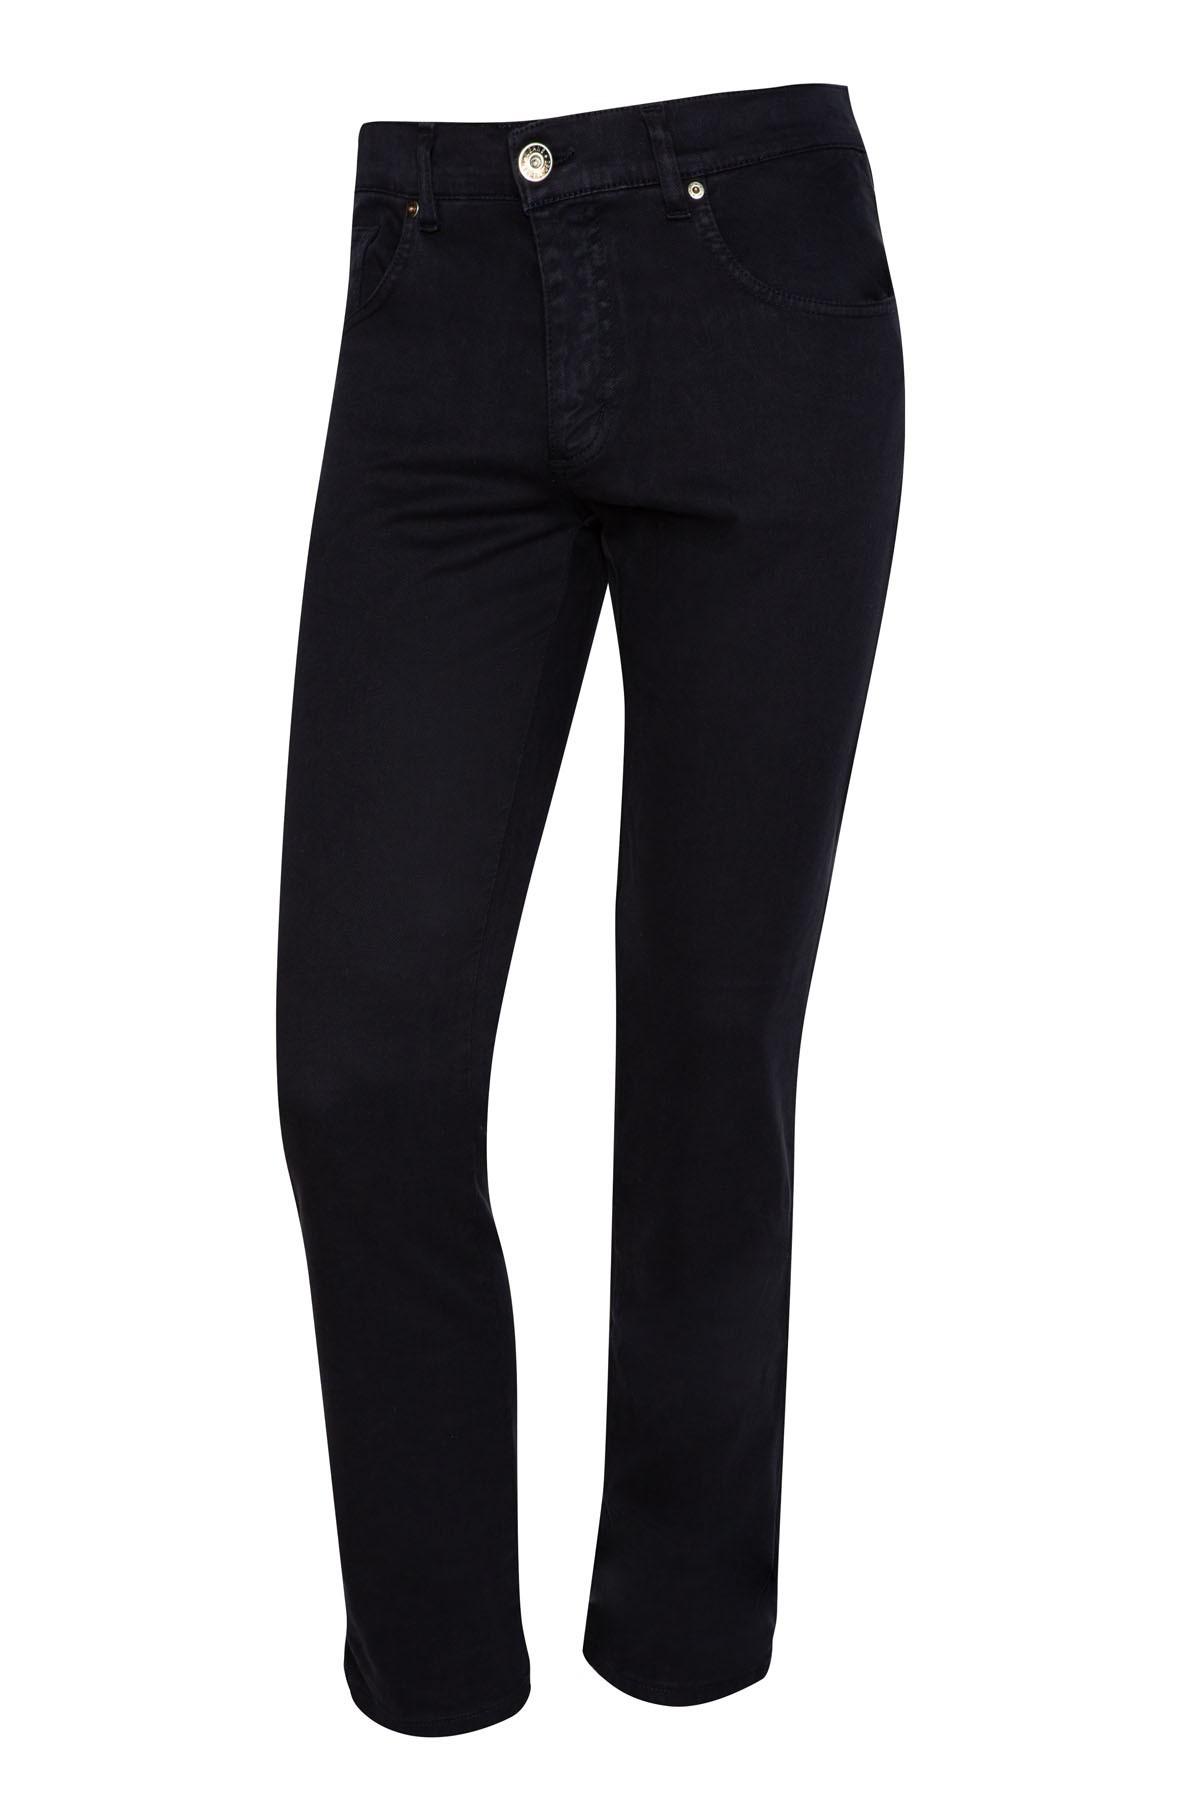 ciemnogranatowe spodnie męskie